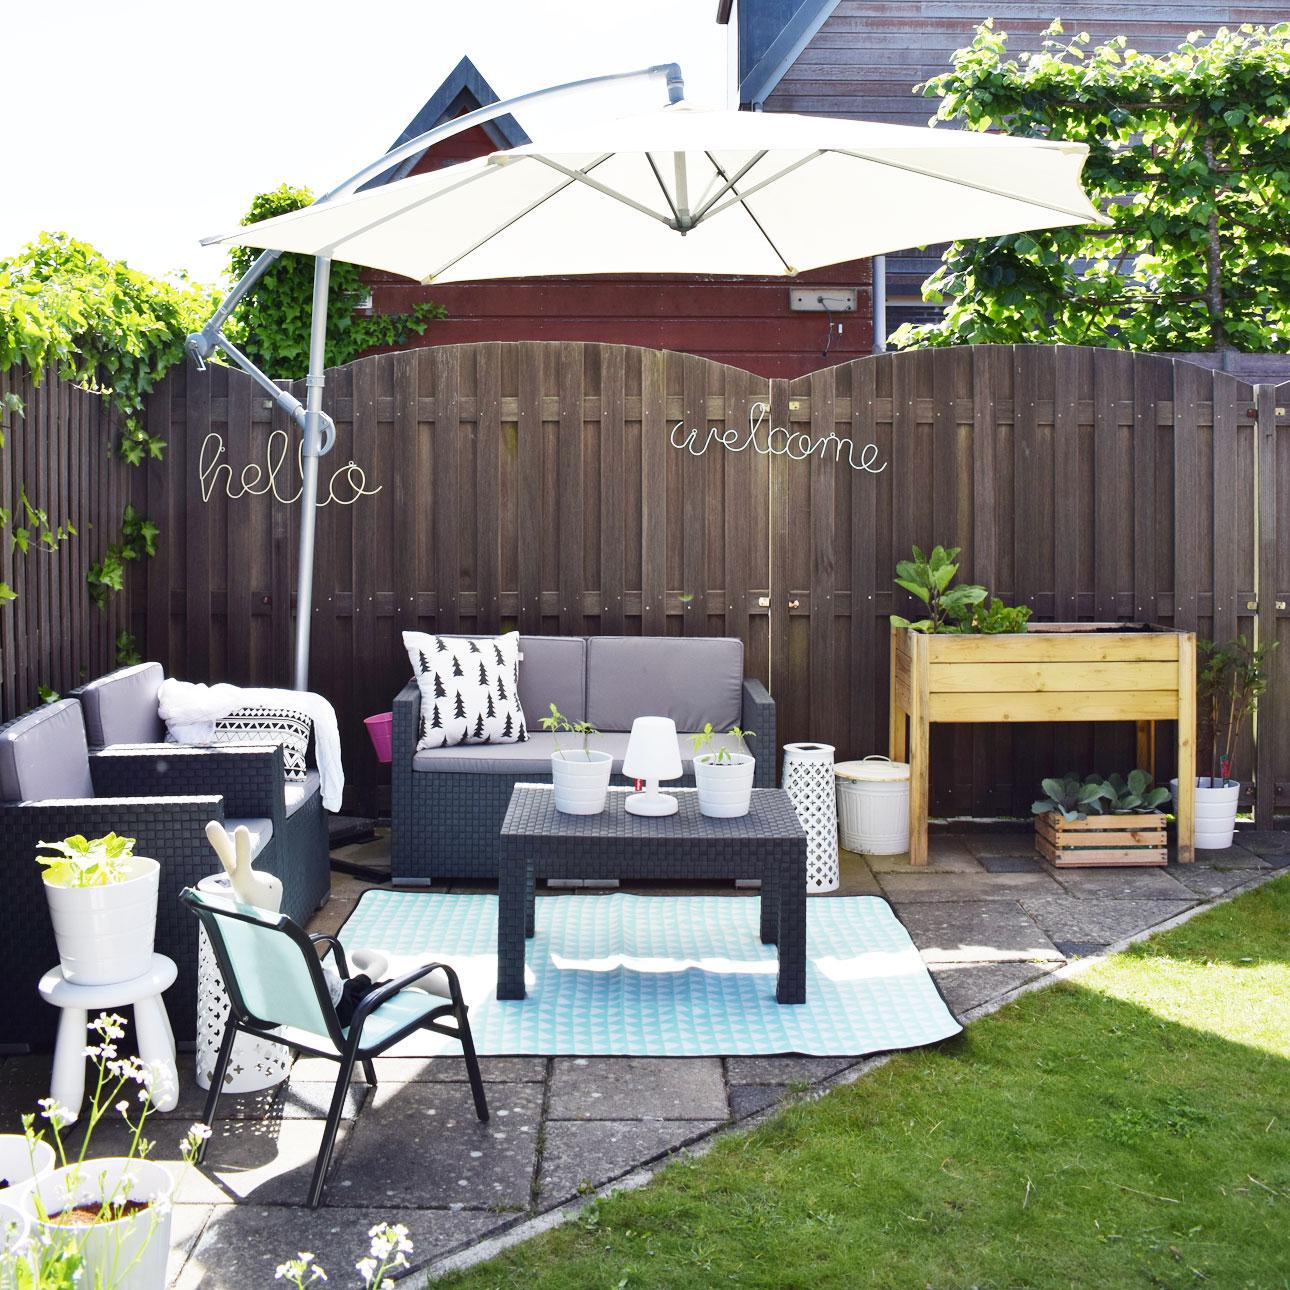 mamalifestyle tuin inspiratie buiten zitten